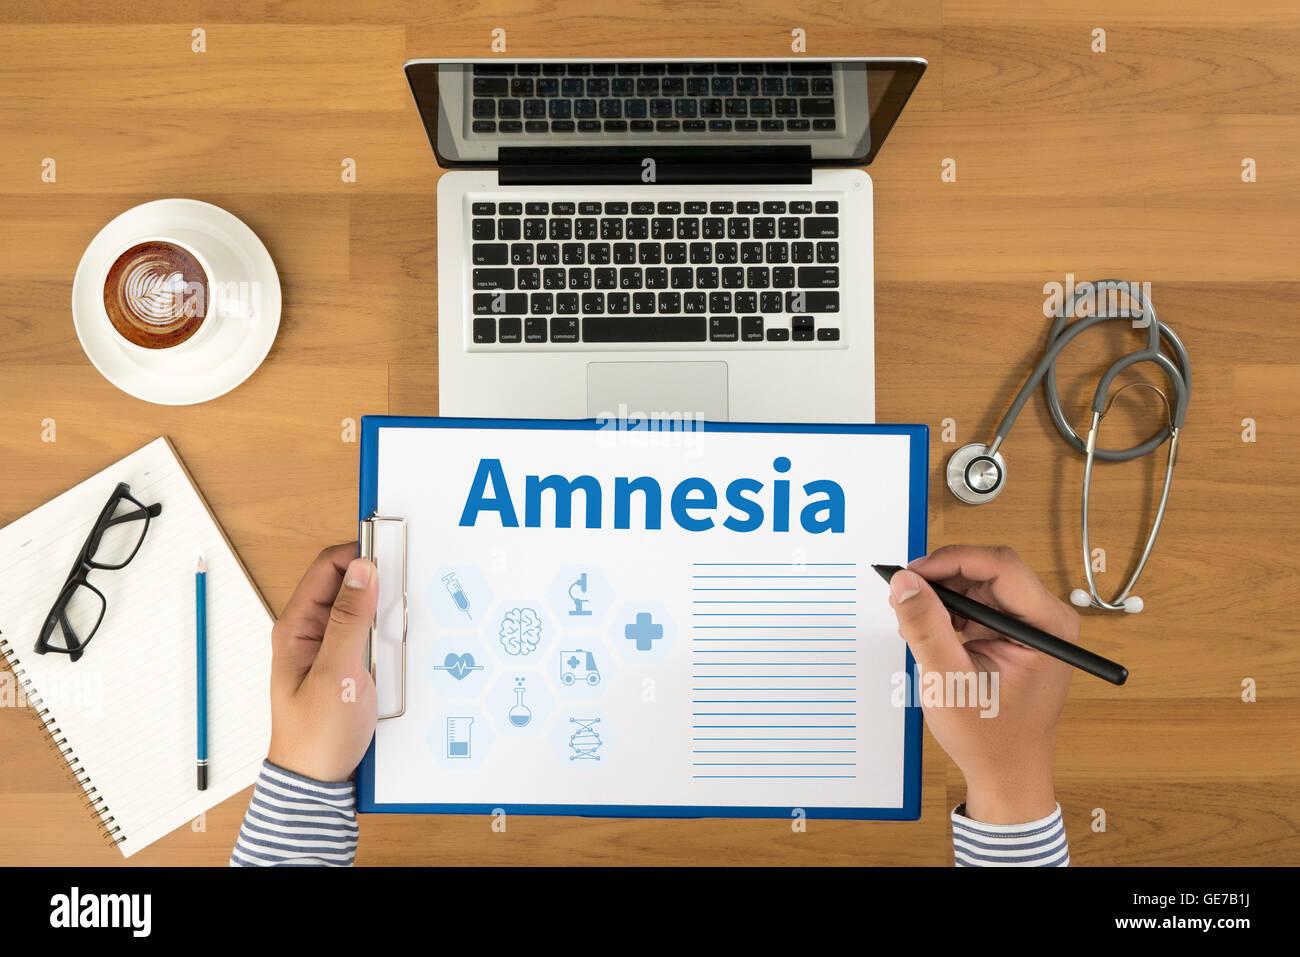 Amnesia - Stock Image